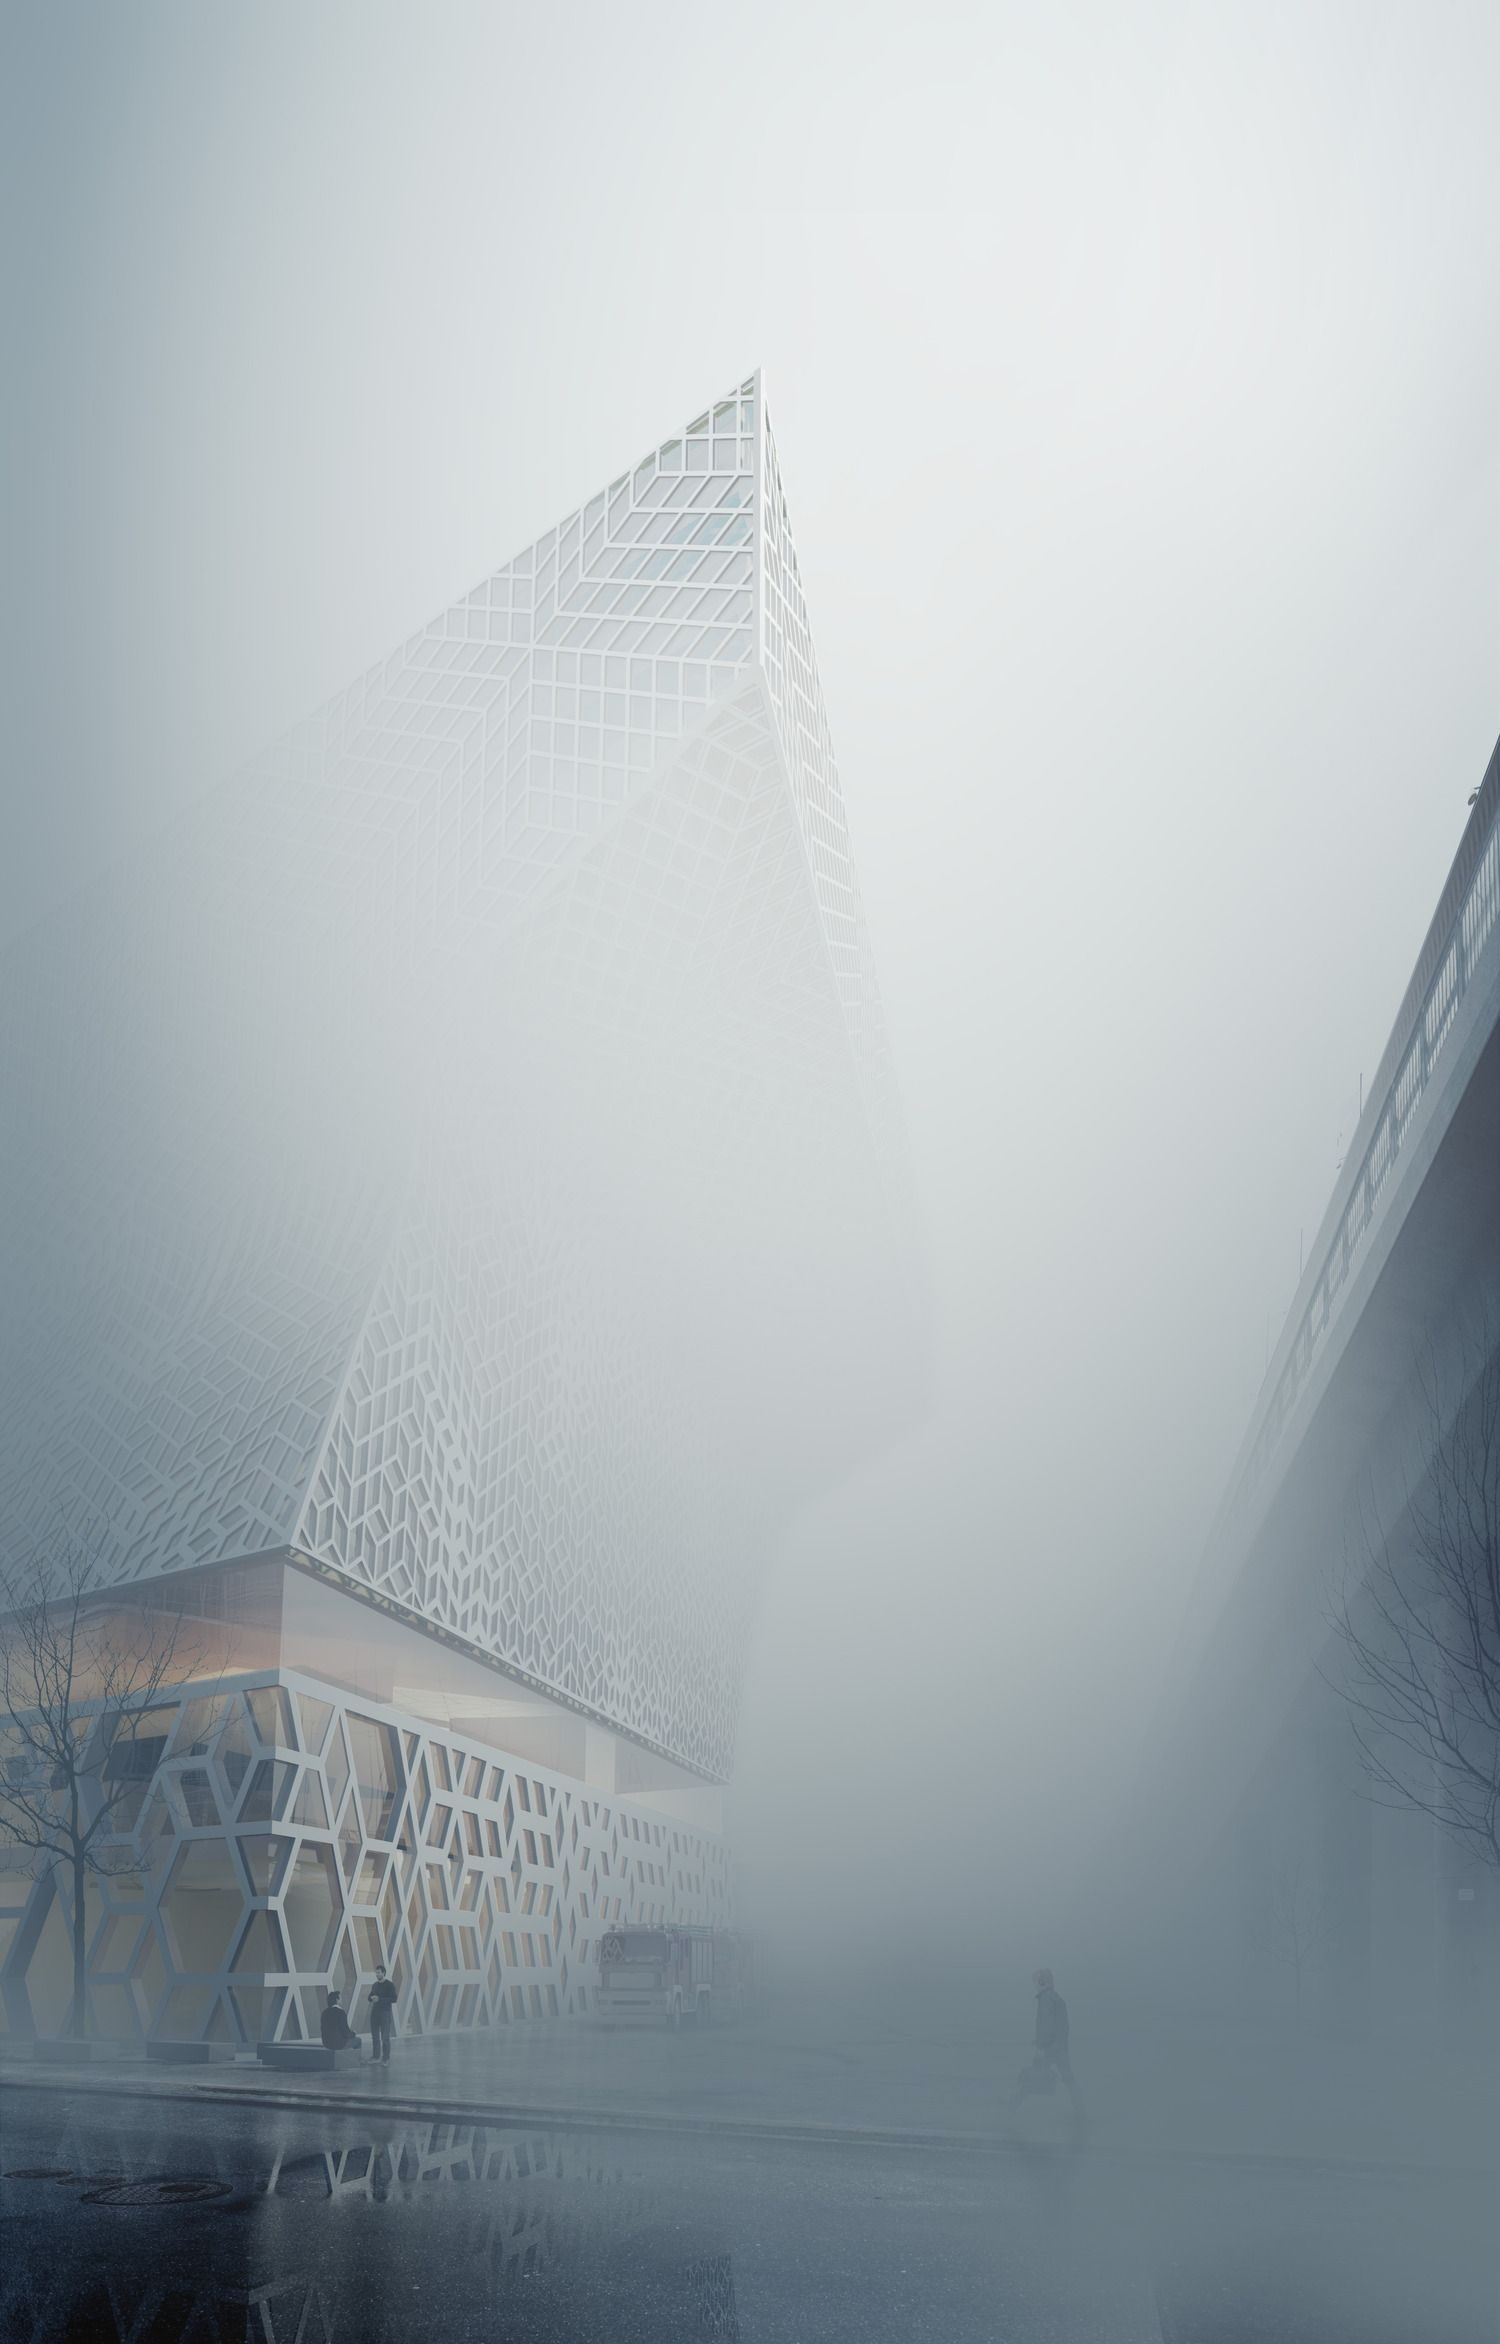 - The Flying Dutchman - Stockholm/Sweden, 2013 by Mir - Bergen, Norway